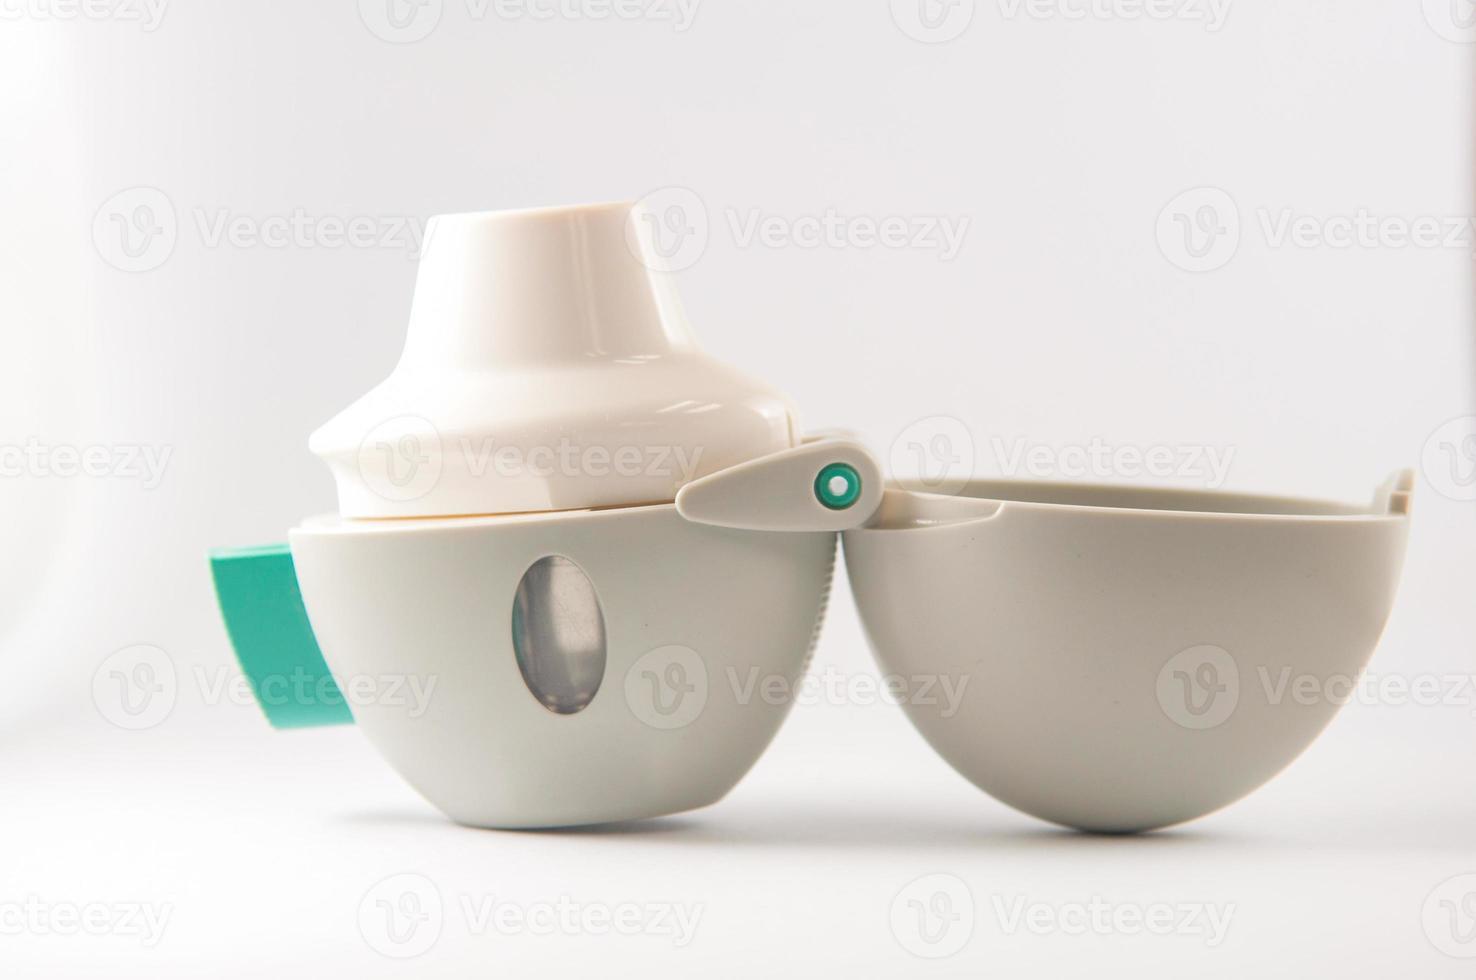 poeder astma-inhalator is apparatuur foto